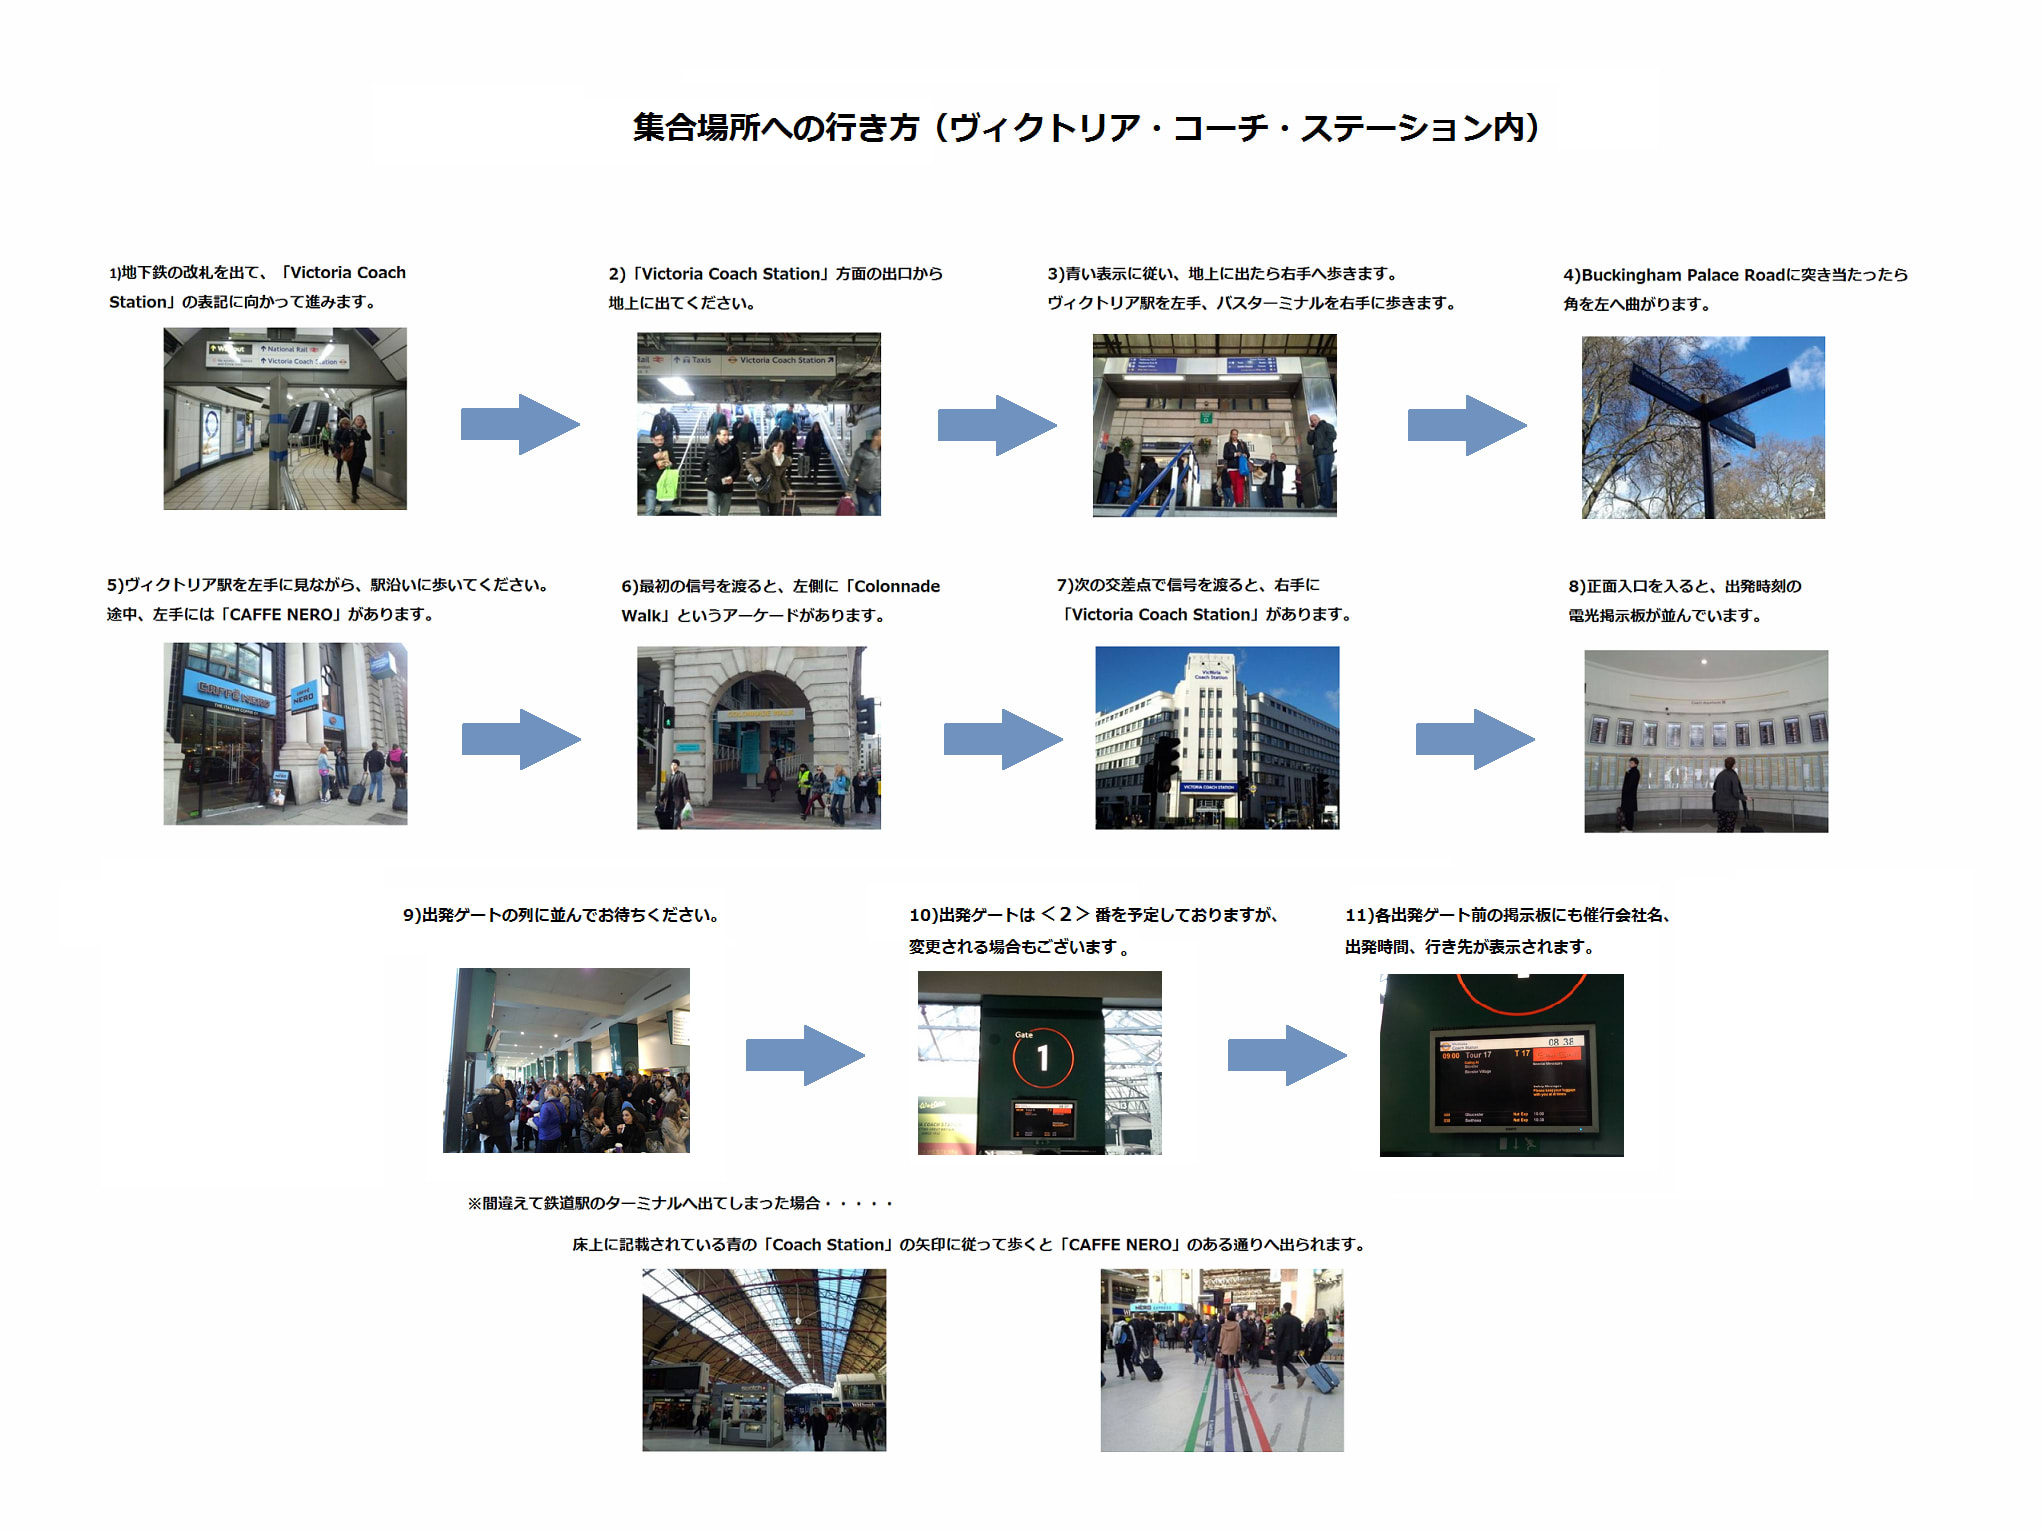 check-in-location(gate 2)